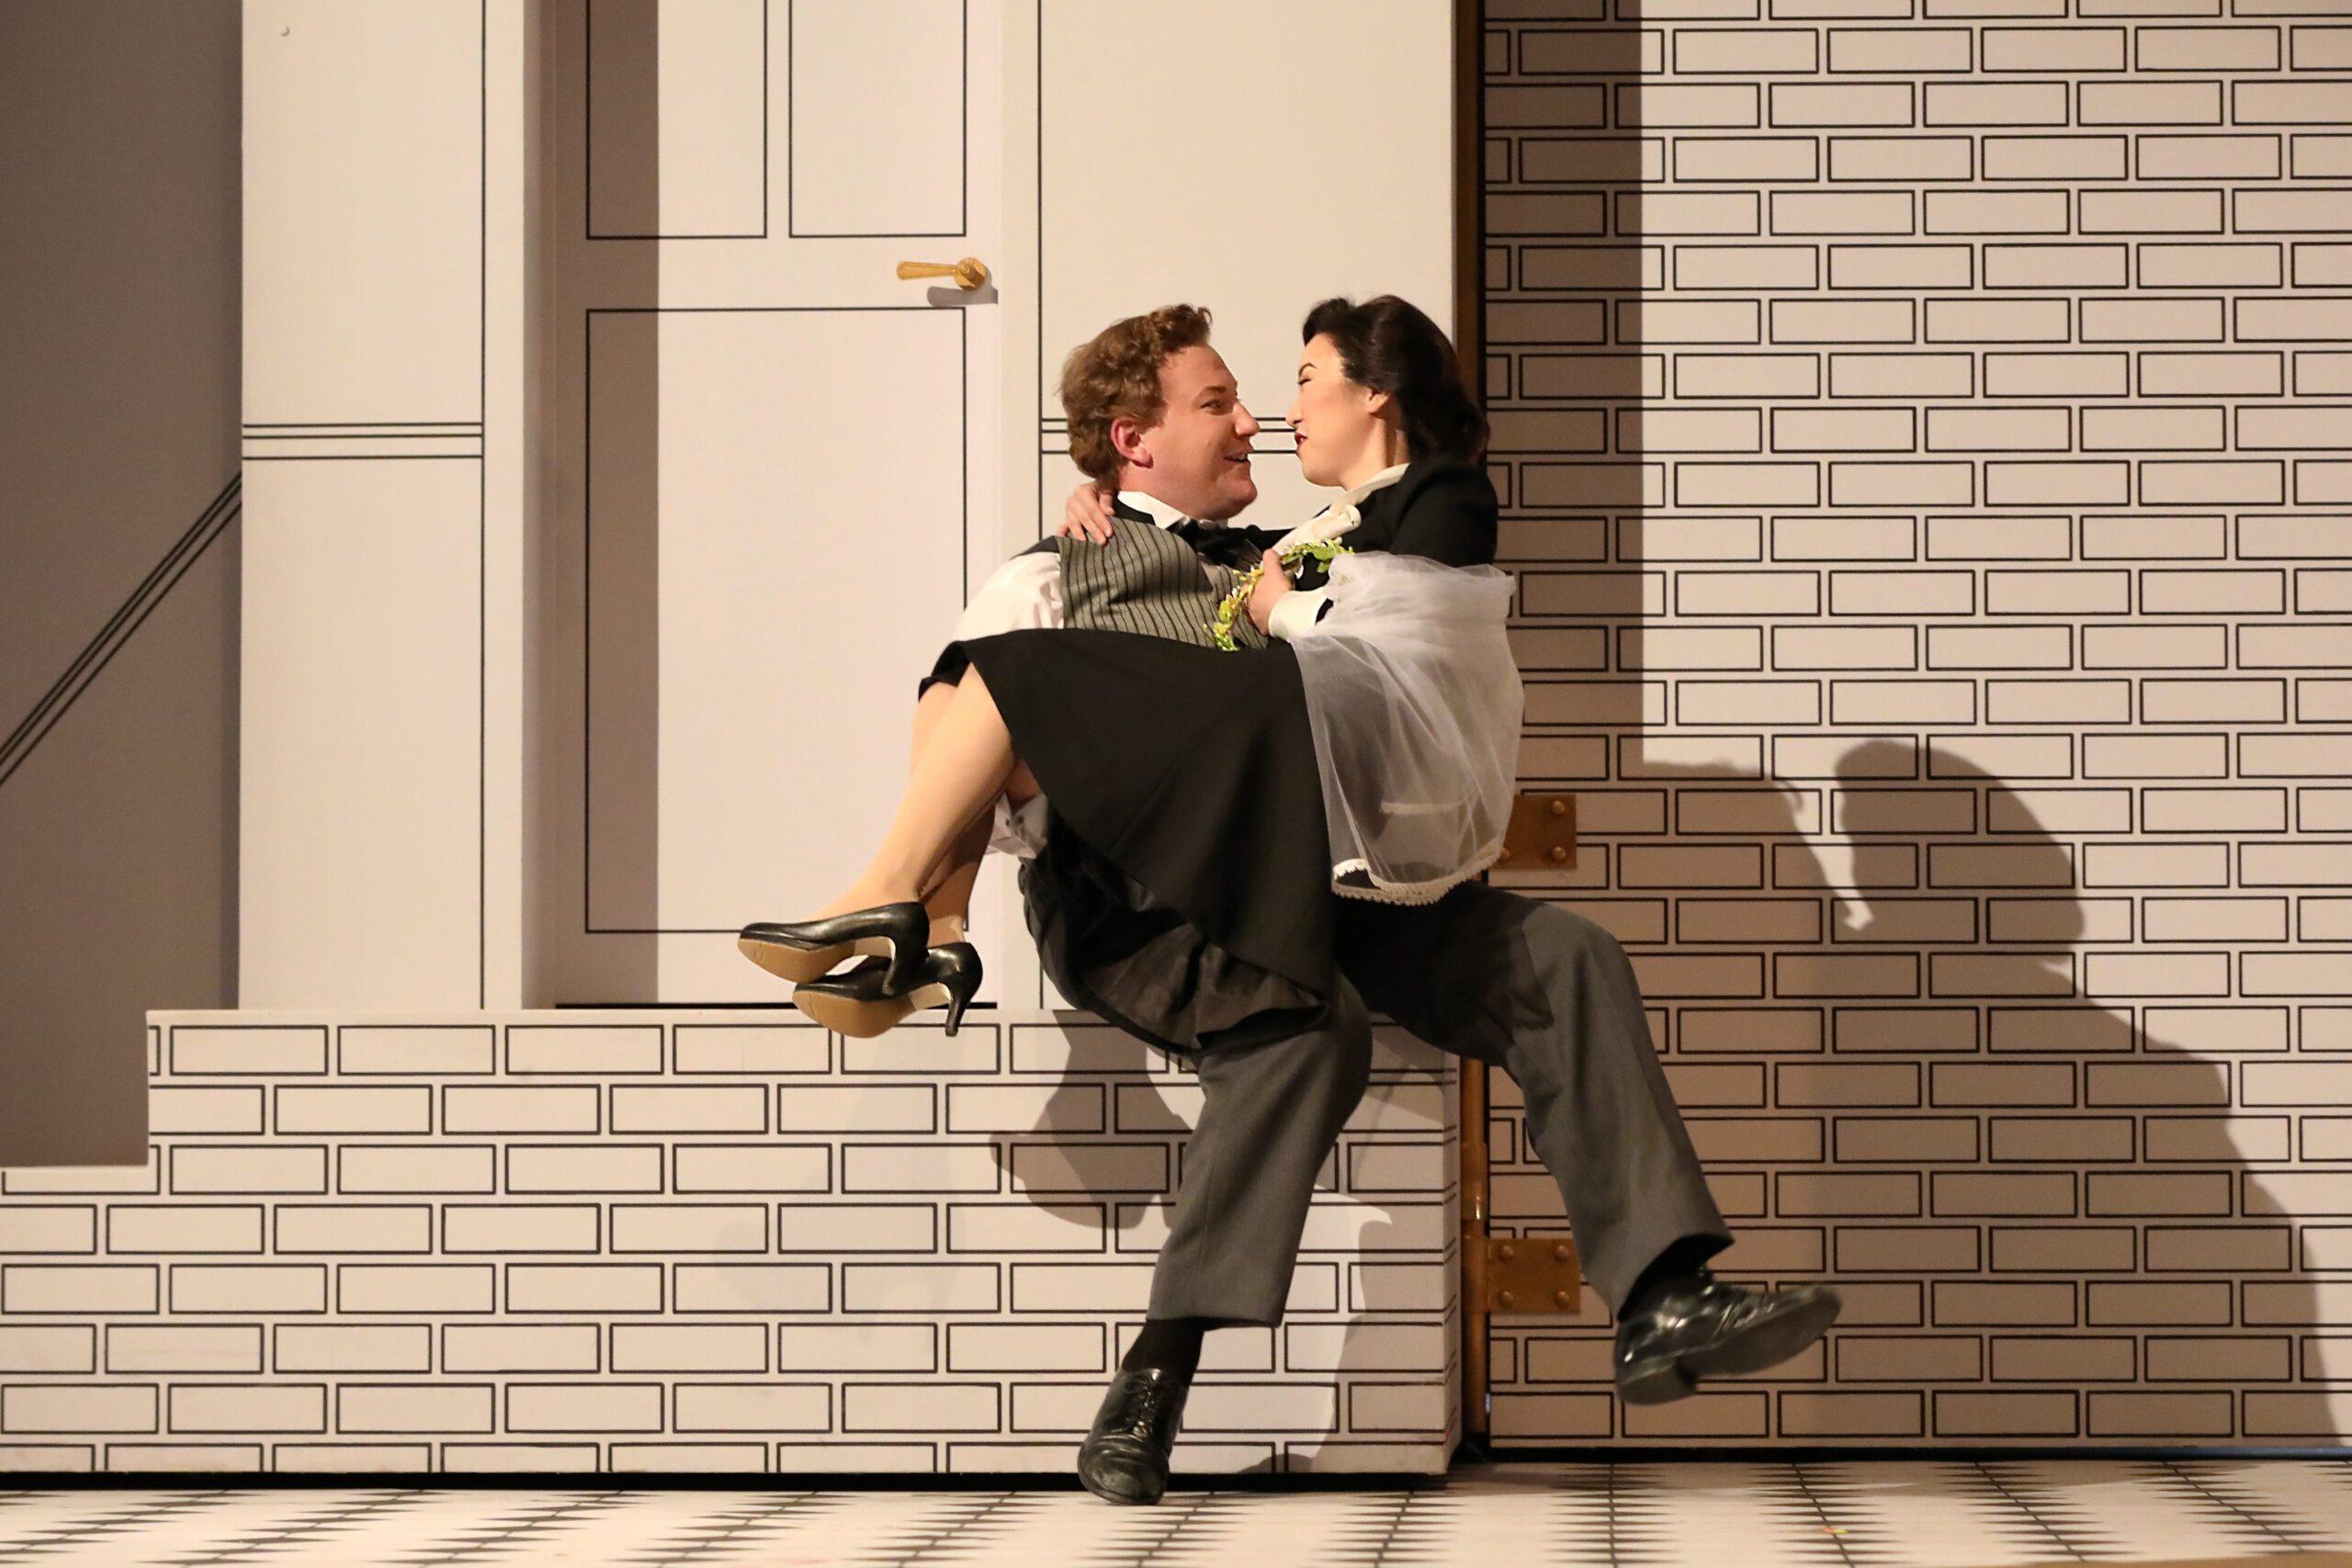 Nicholas Brownlee (Figaro), Ying Fang (Susanna). Photo Credit: Curtis Brown For The Santa Fe Opera, 2021